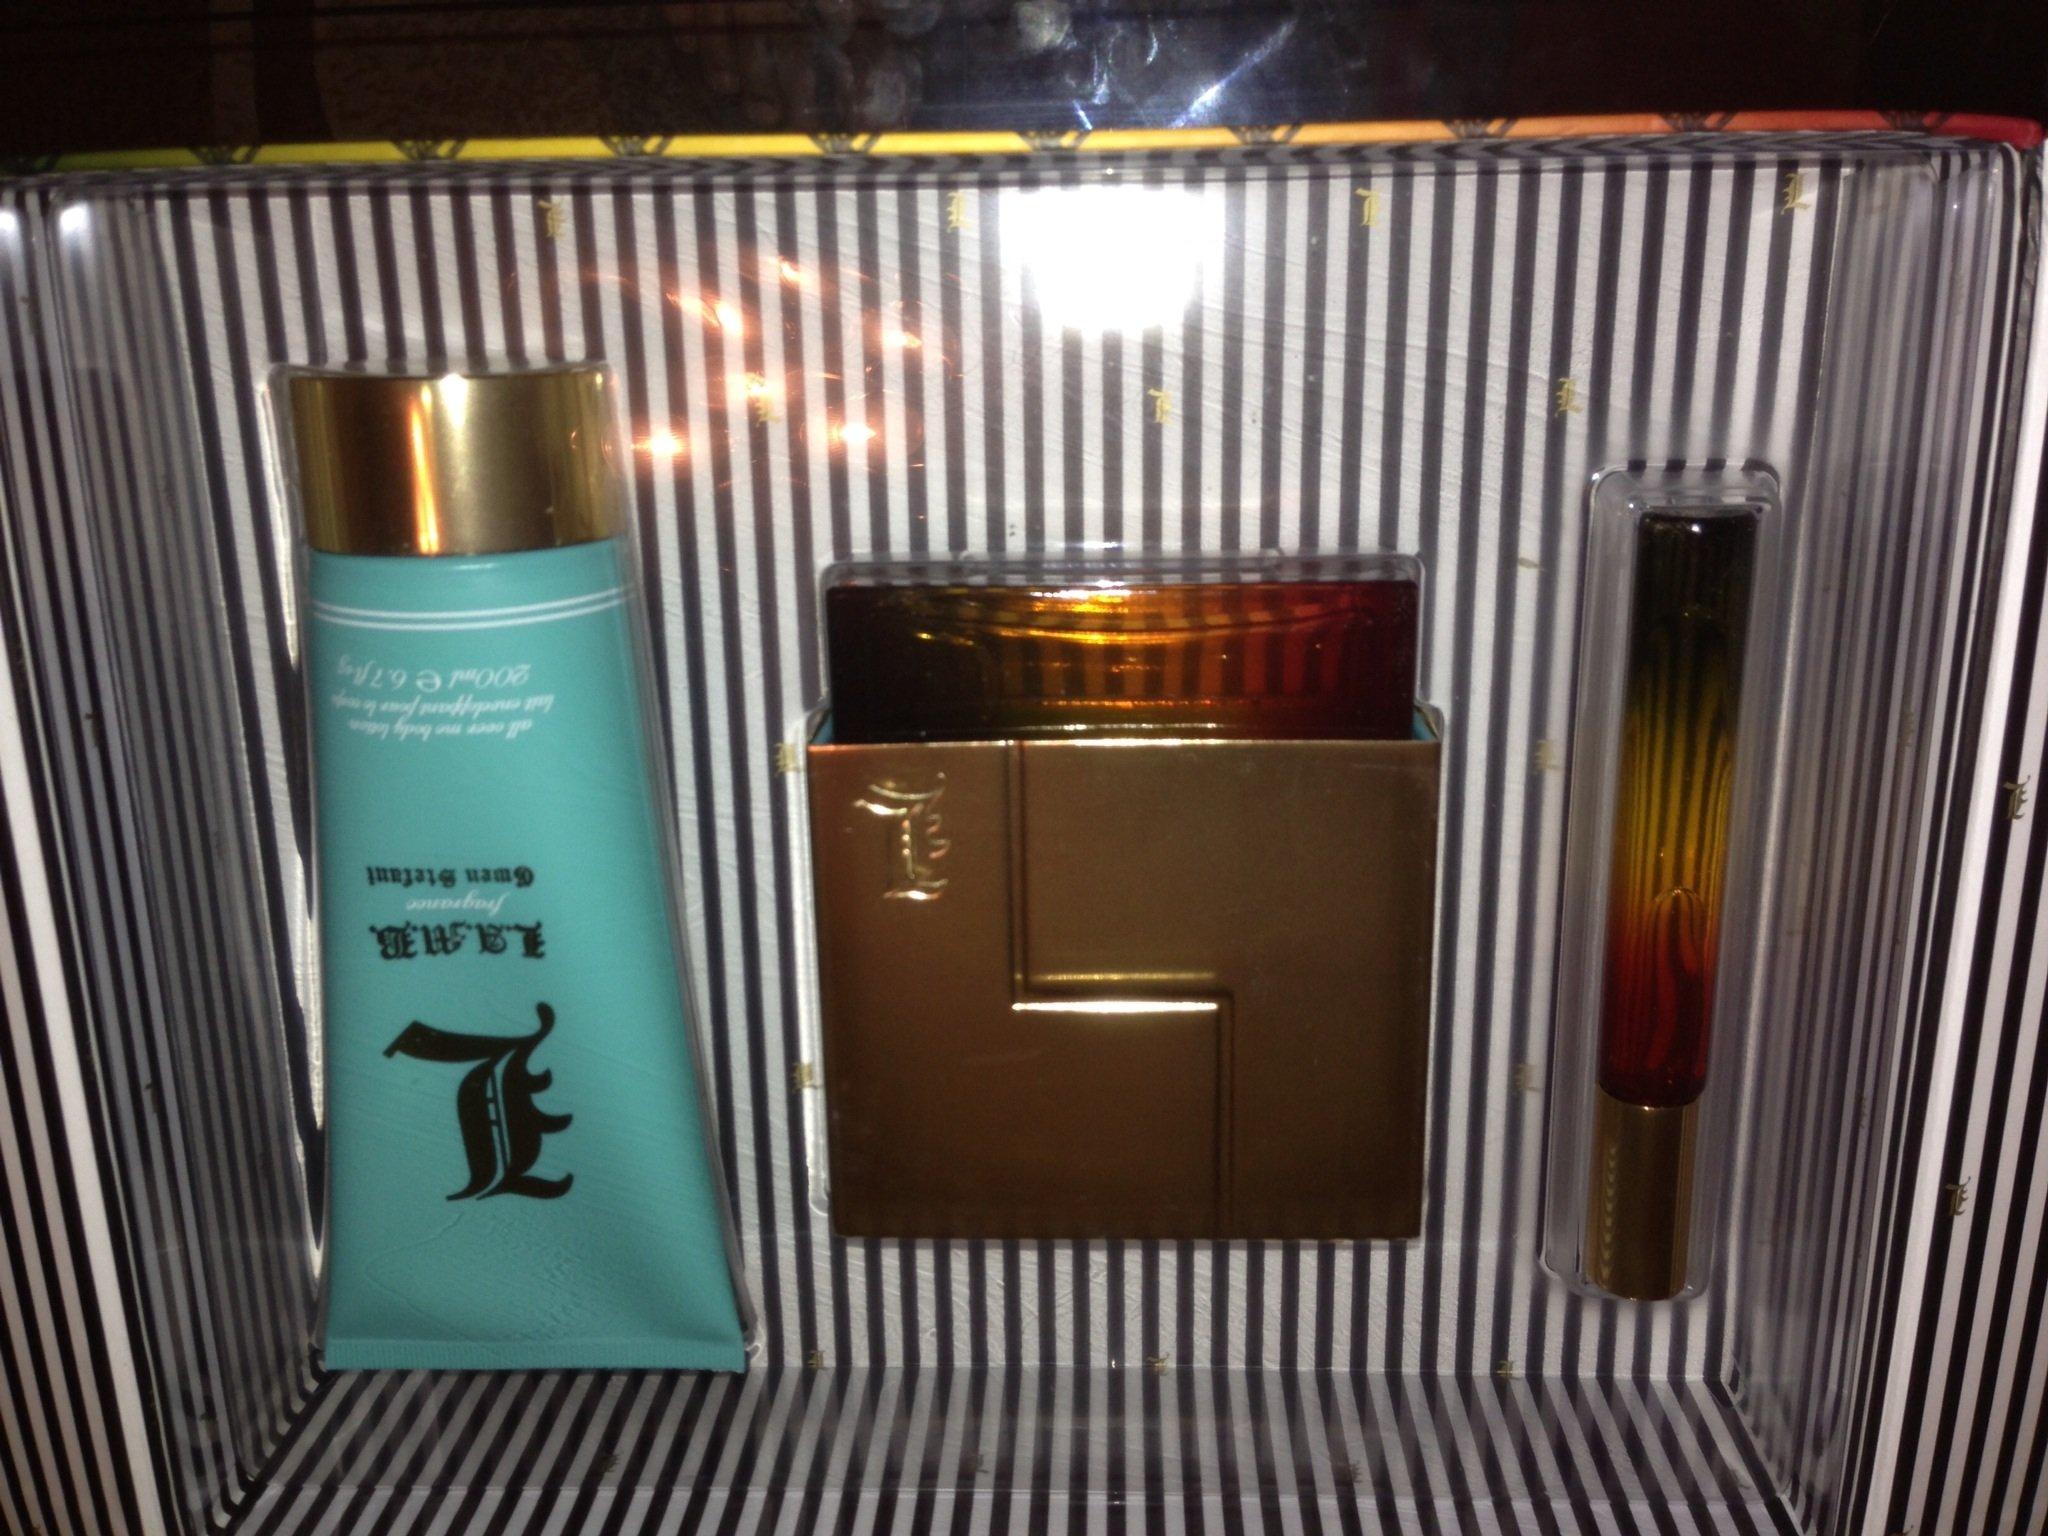 Gwen Stefani Lamb 3 Pc Parfume SET EDP 3.4 Oz 6.7 Body Lotion and EDP Roller Ball .2 Oz